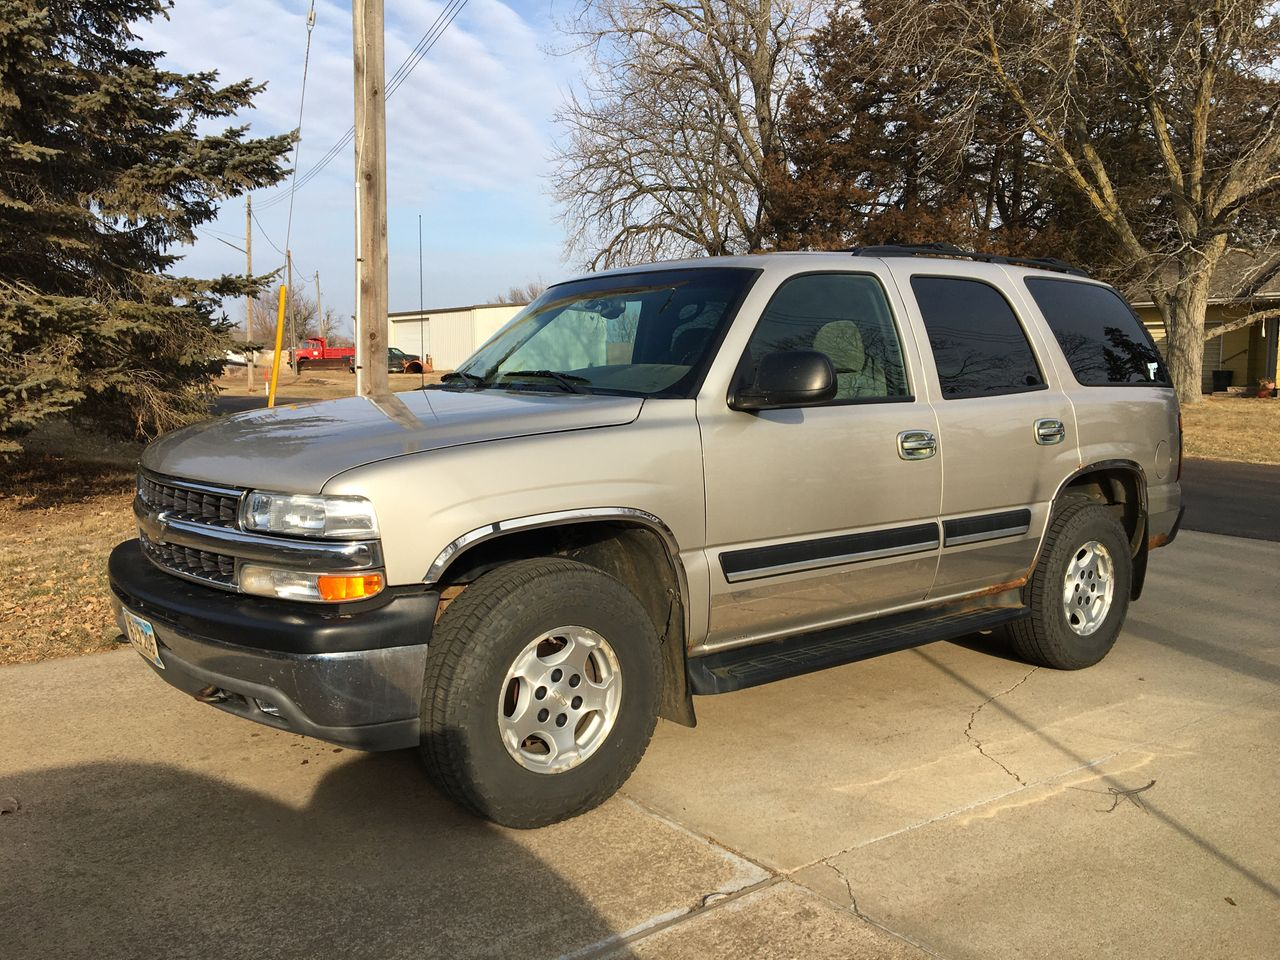 2005 Chevrolet Tahoe LT   Marion, SD, Sandstone Metallic (Brown & Beige), 4 Wheel